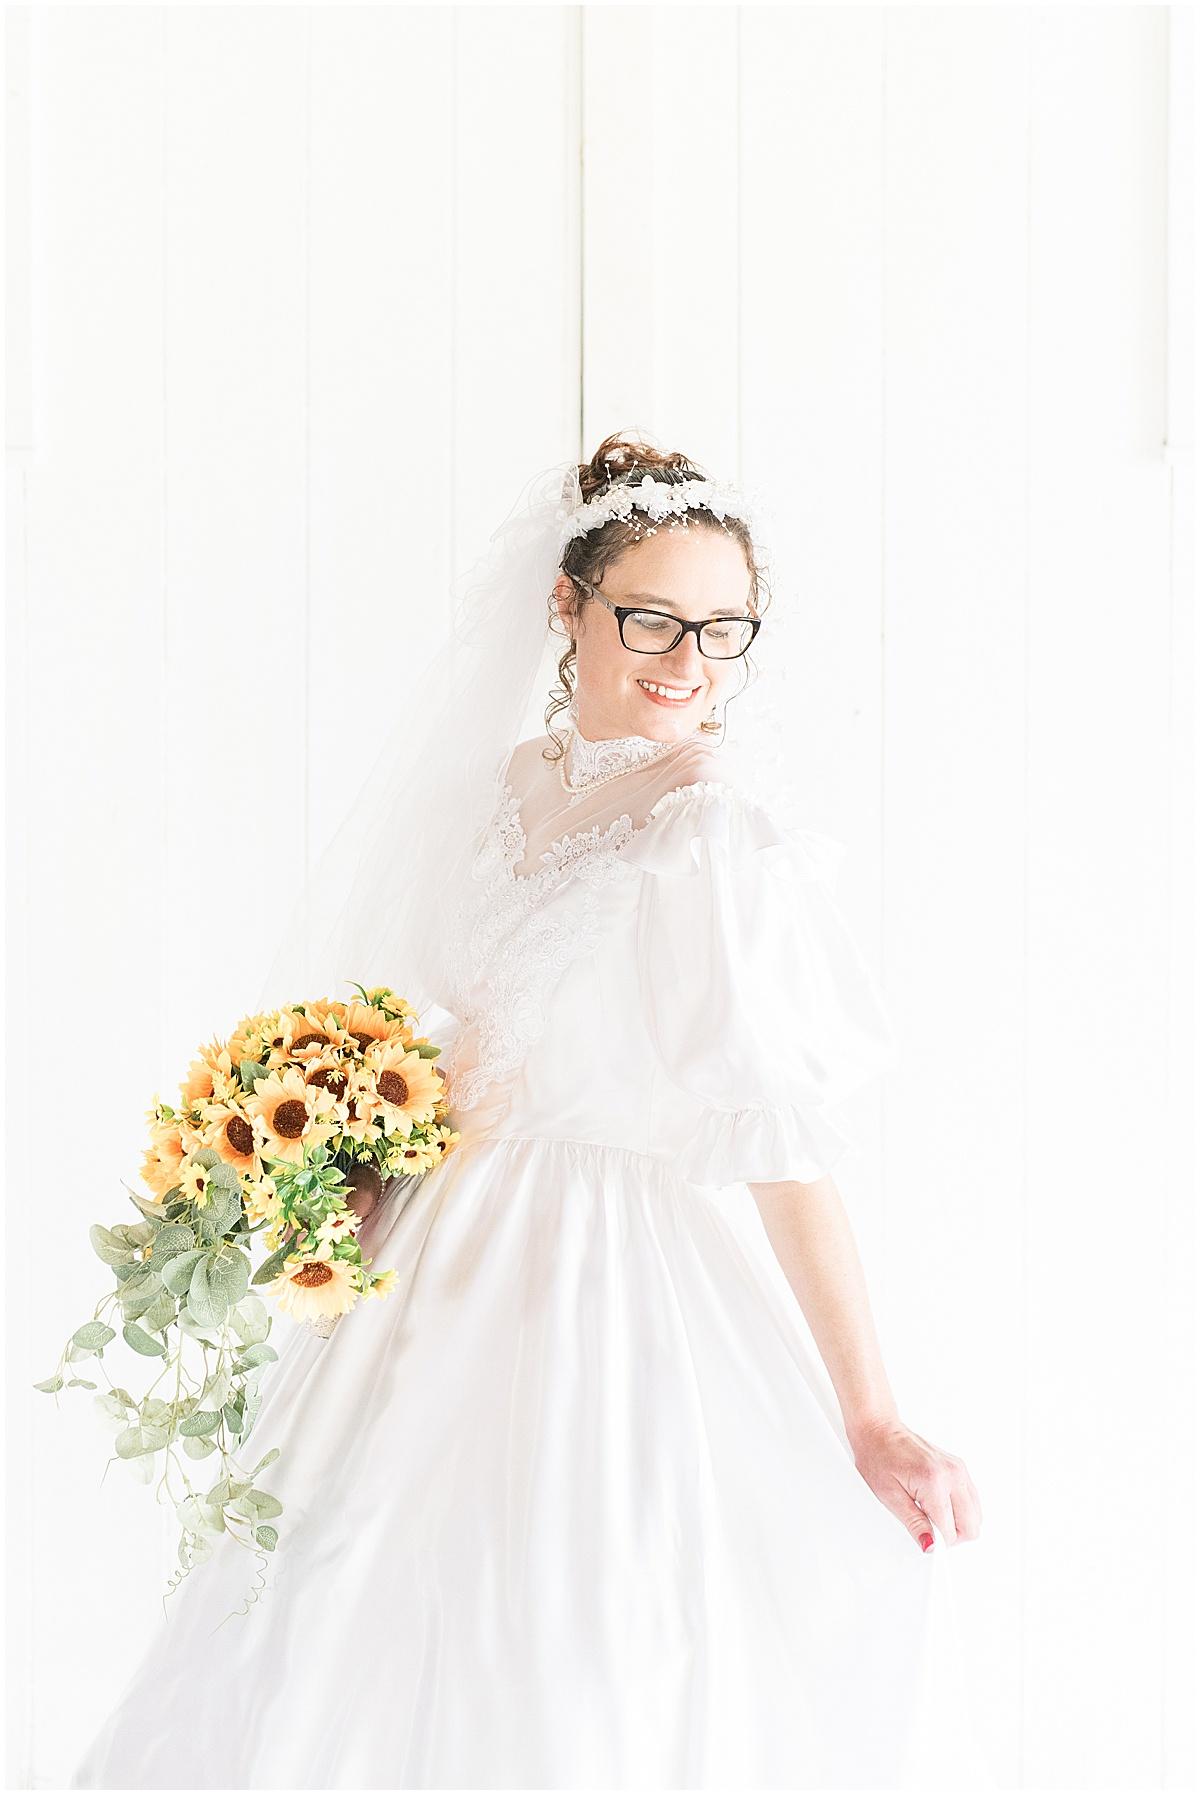 Bridal portraits at Exploration Acres wedding in Lafayette, Indiana